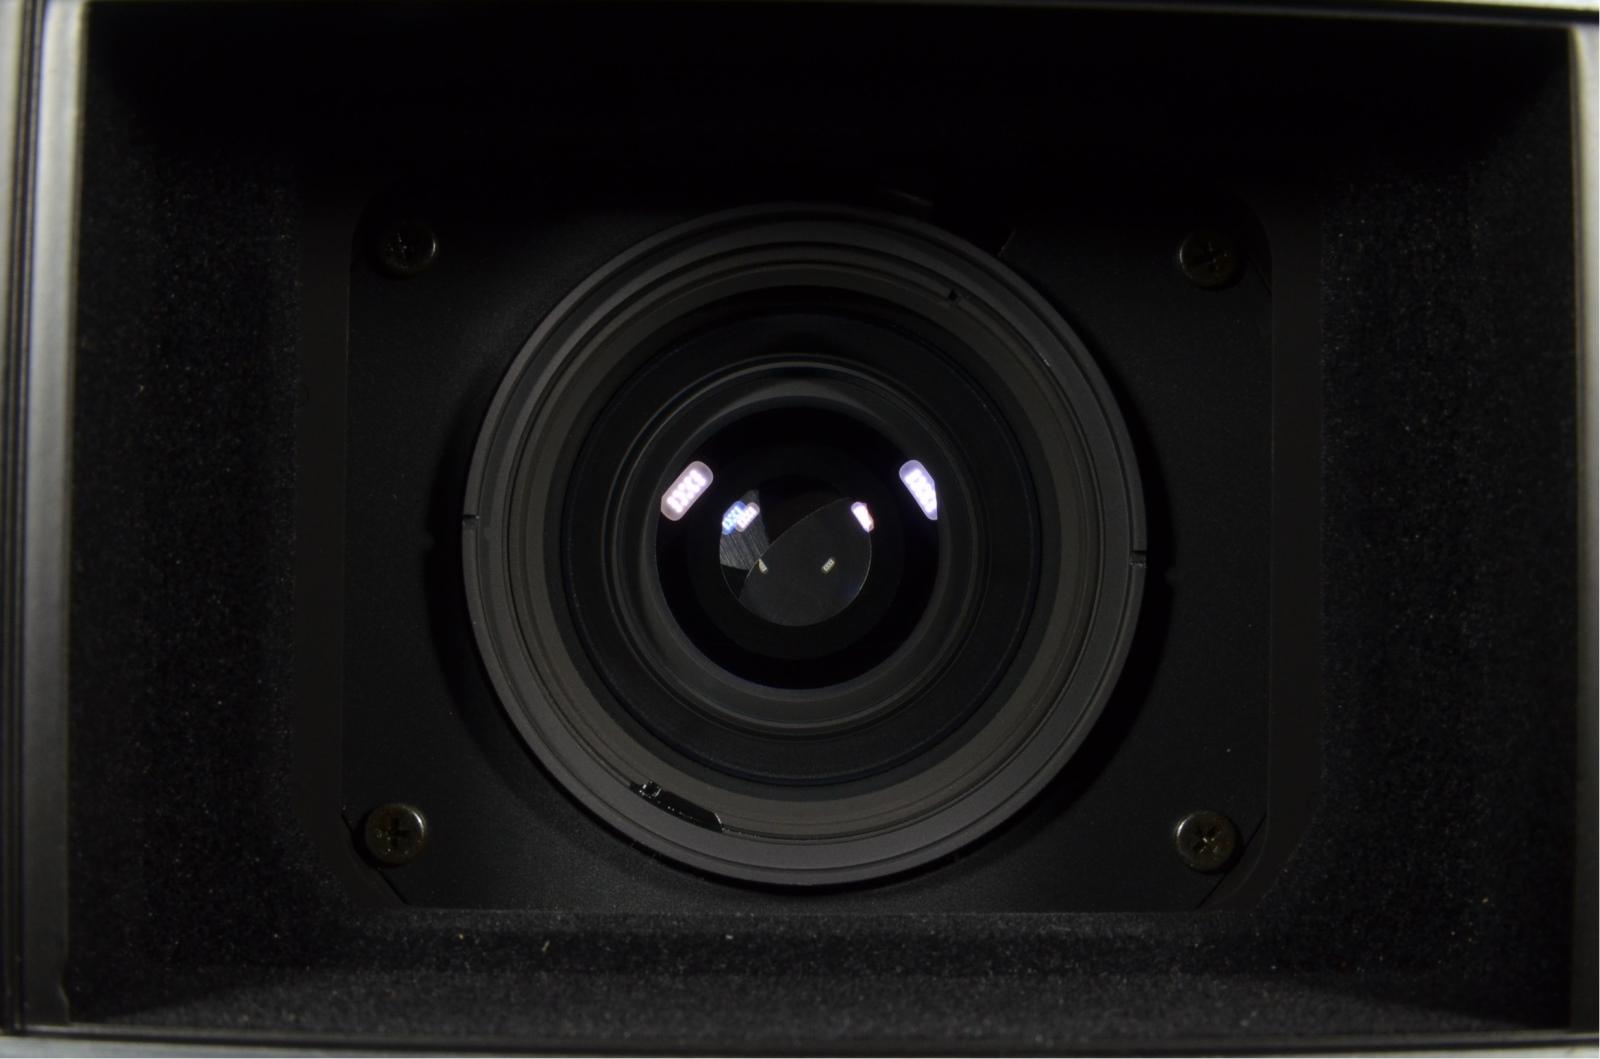 fuji fujifilm gsw690iii professional ebc 65mm f5.6 count '219'